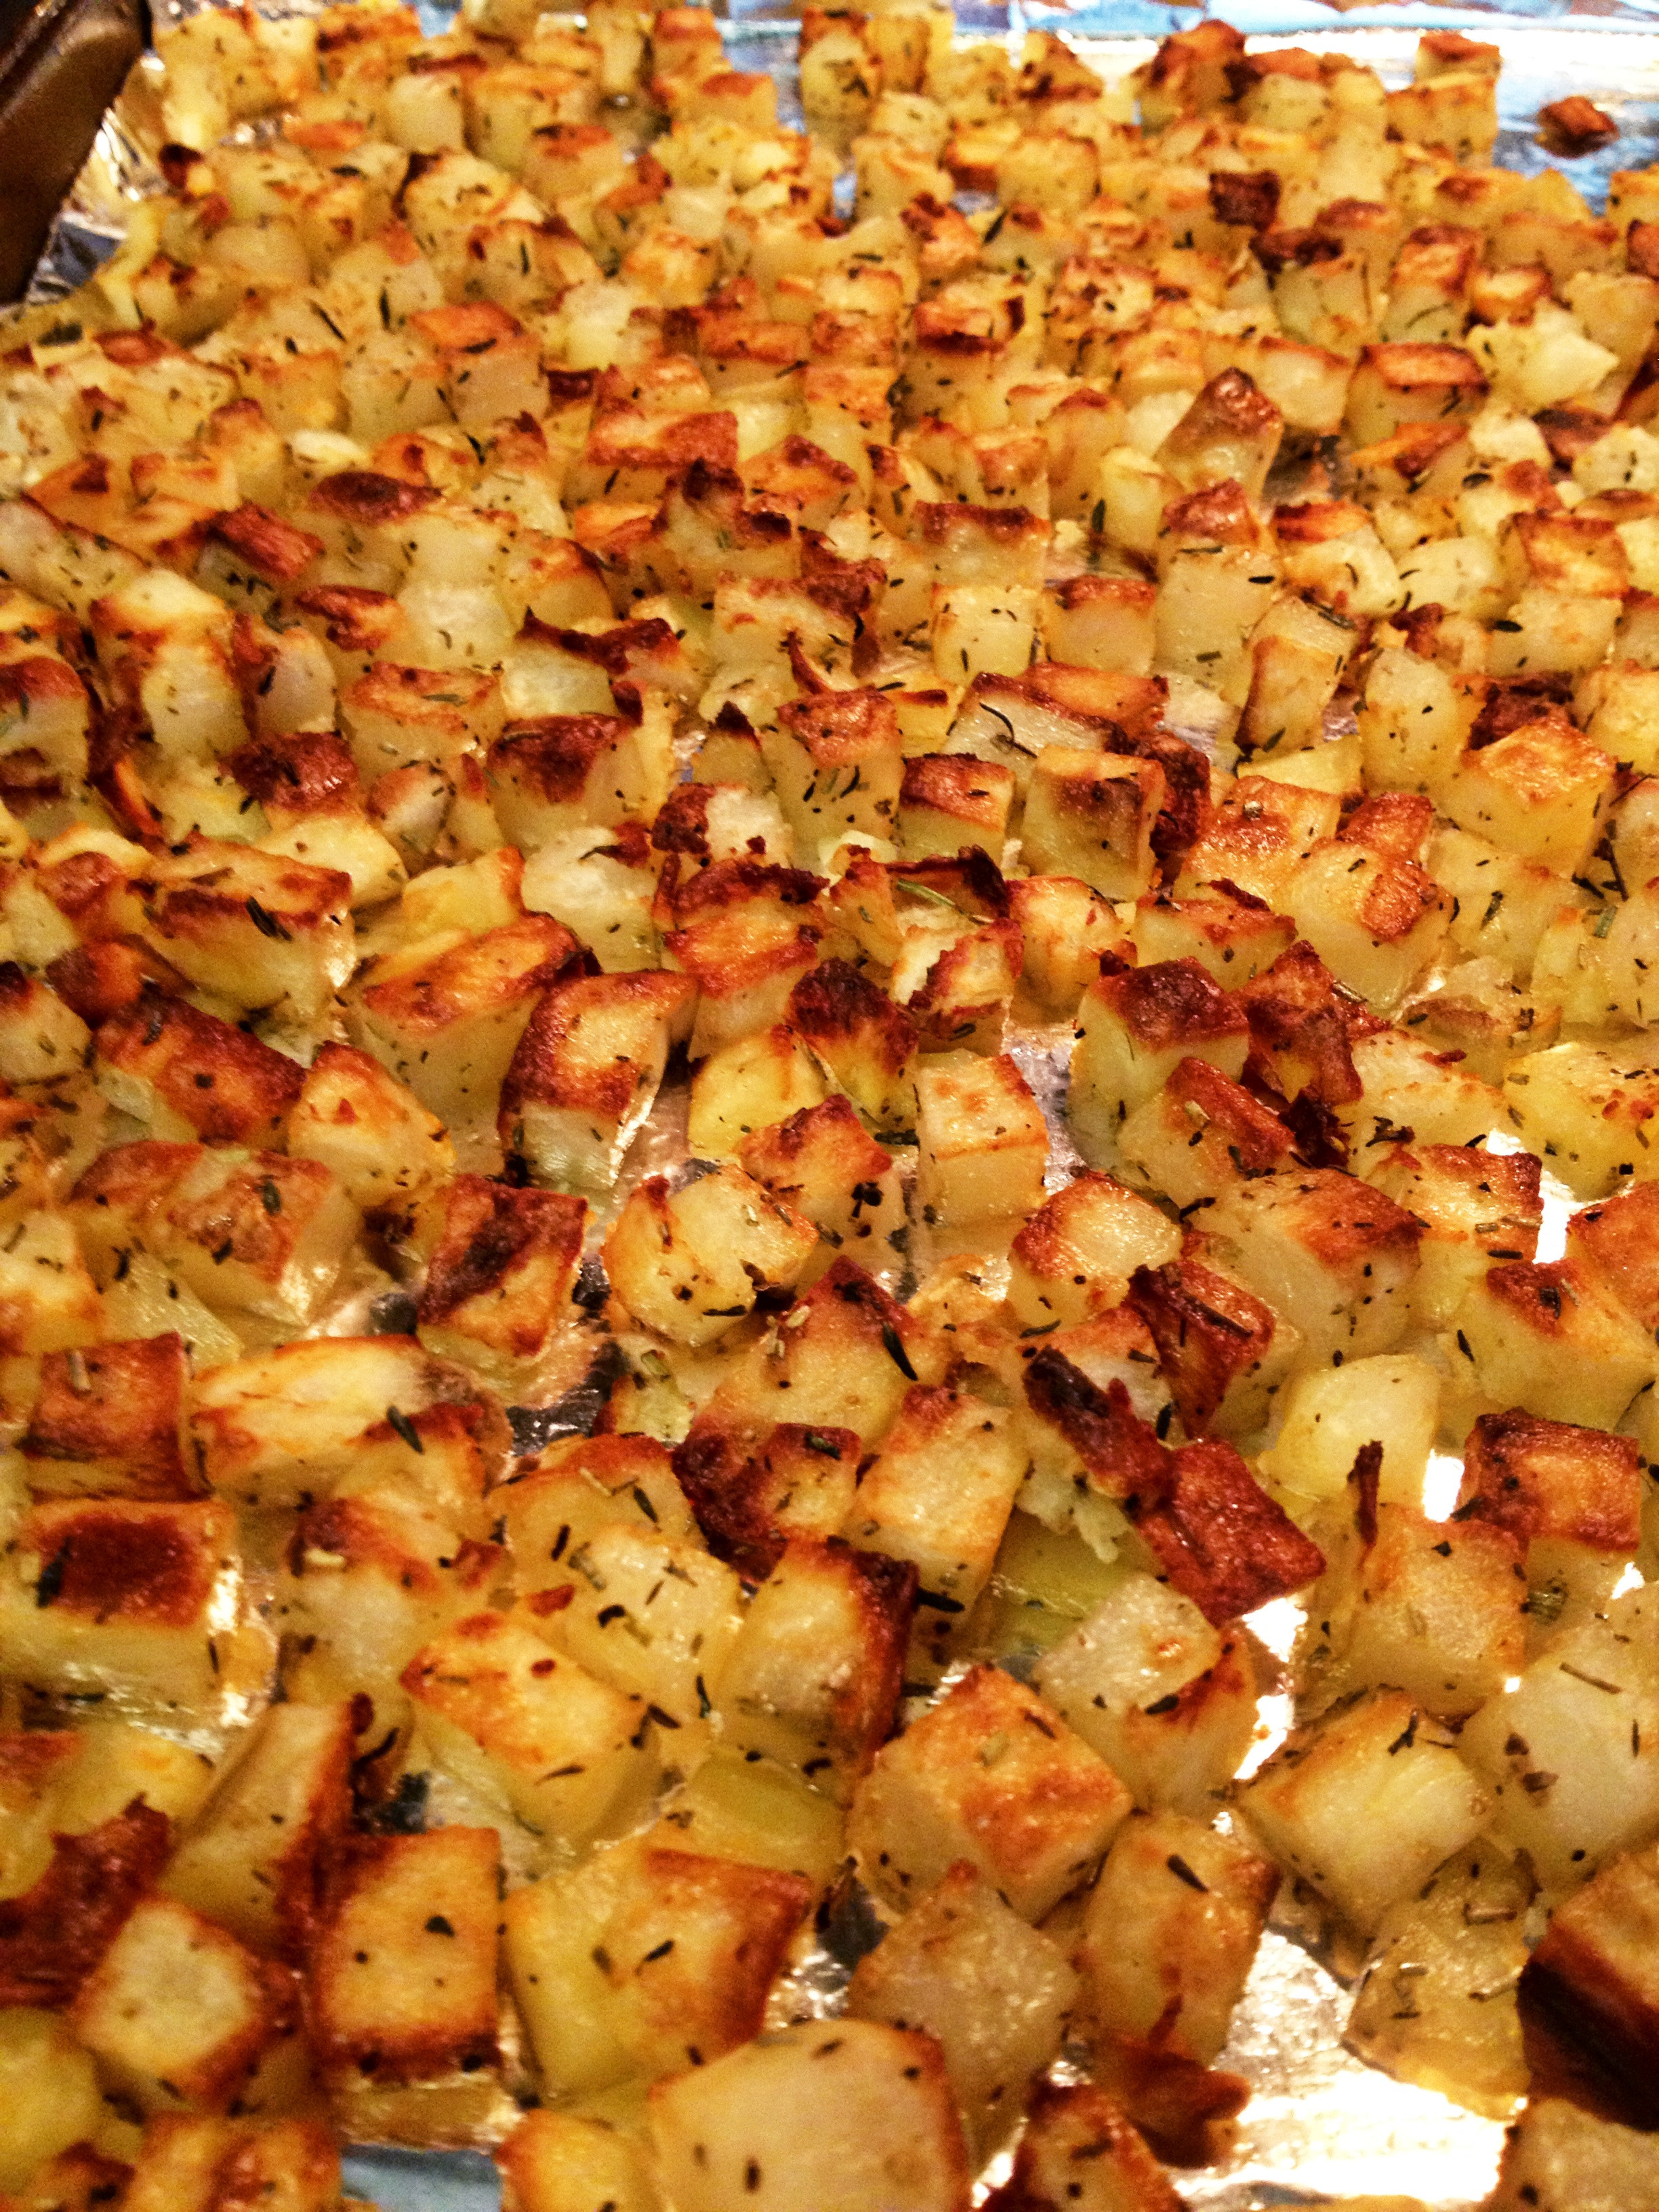 Diced Breakfast Potatoes  Oven Roasted Breakfast Potatoes